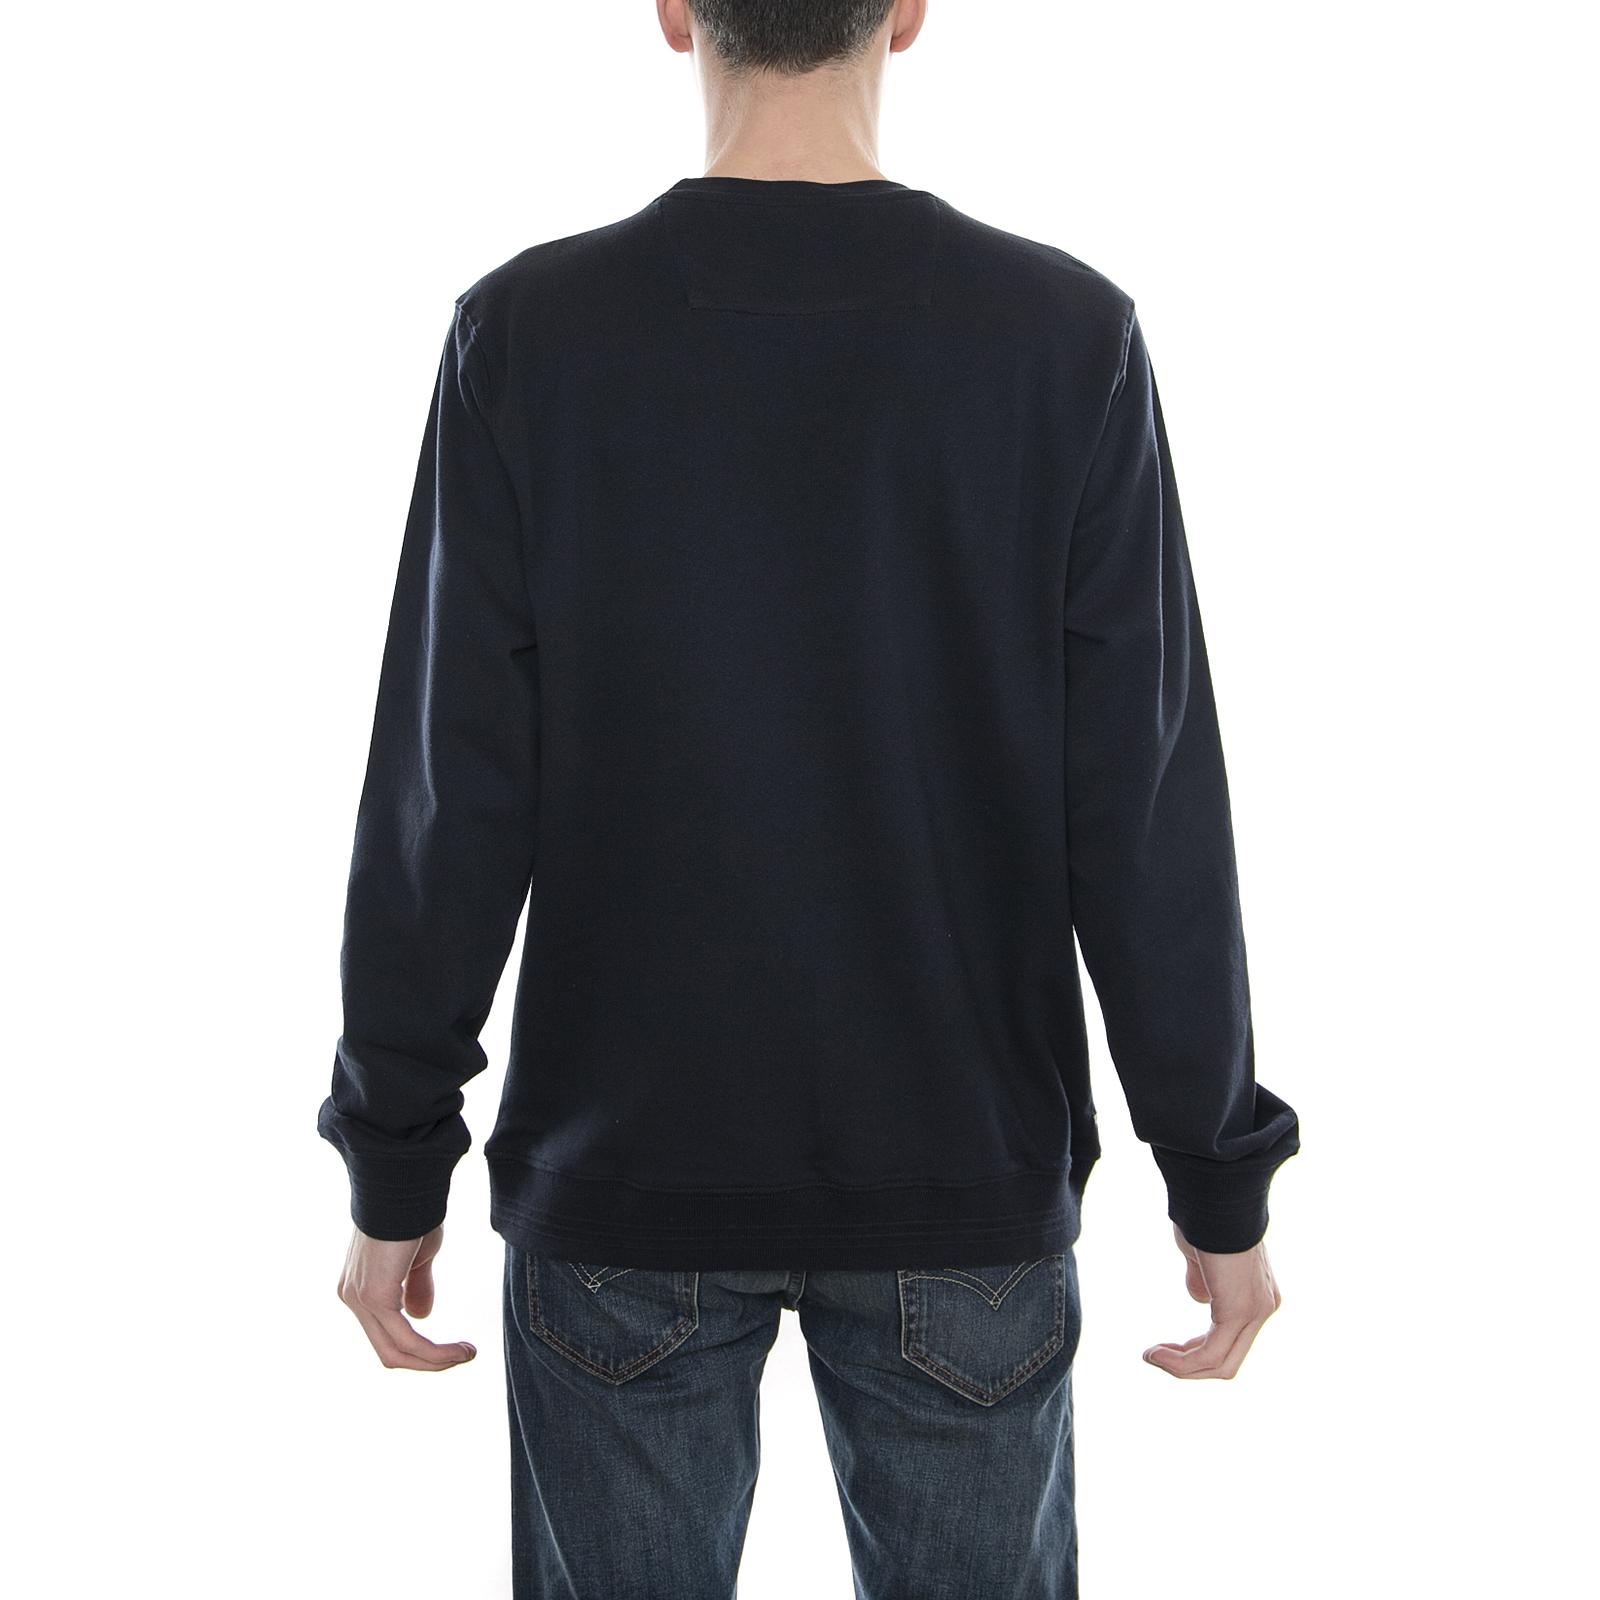 Weekend Offender Sweatshirts Bleu Frazier Bleu Sweatshirts Marine 9e4ad4